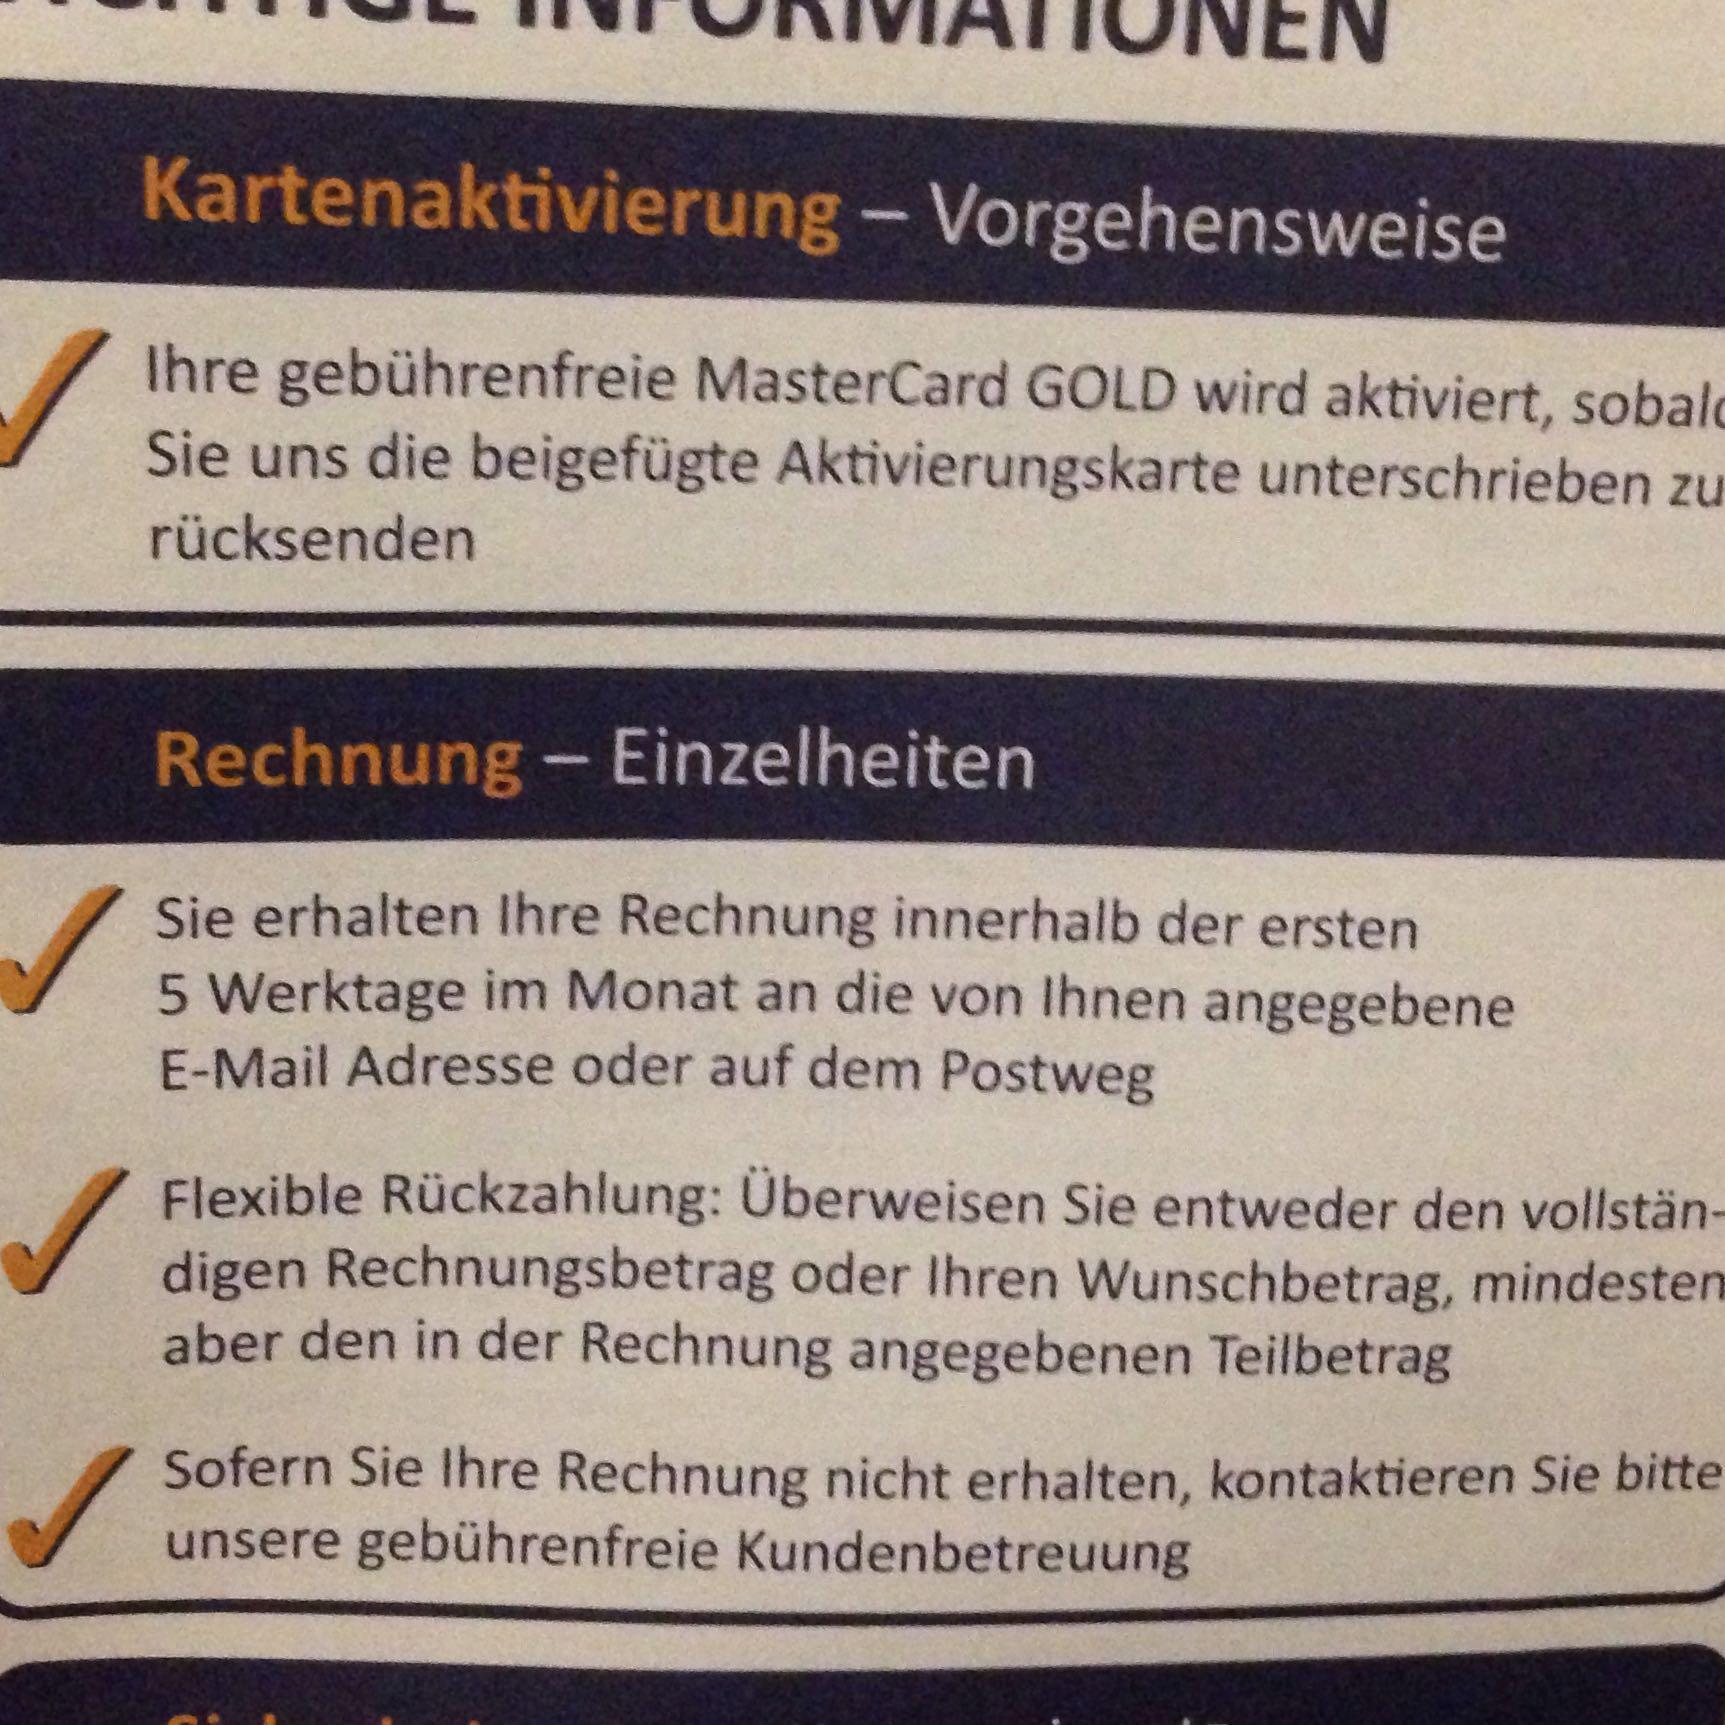 goldcard getmore mastercard kostenlos rechnung. Black Bedroom Furniture Sets. Home Design Ideas